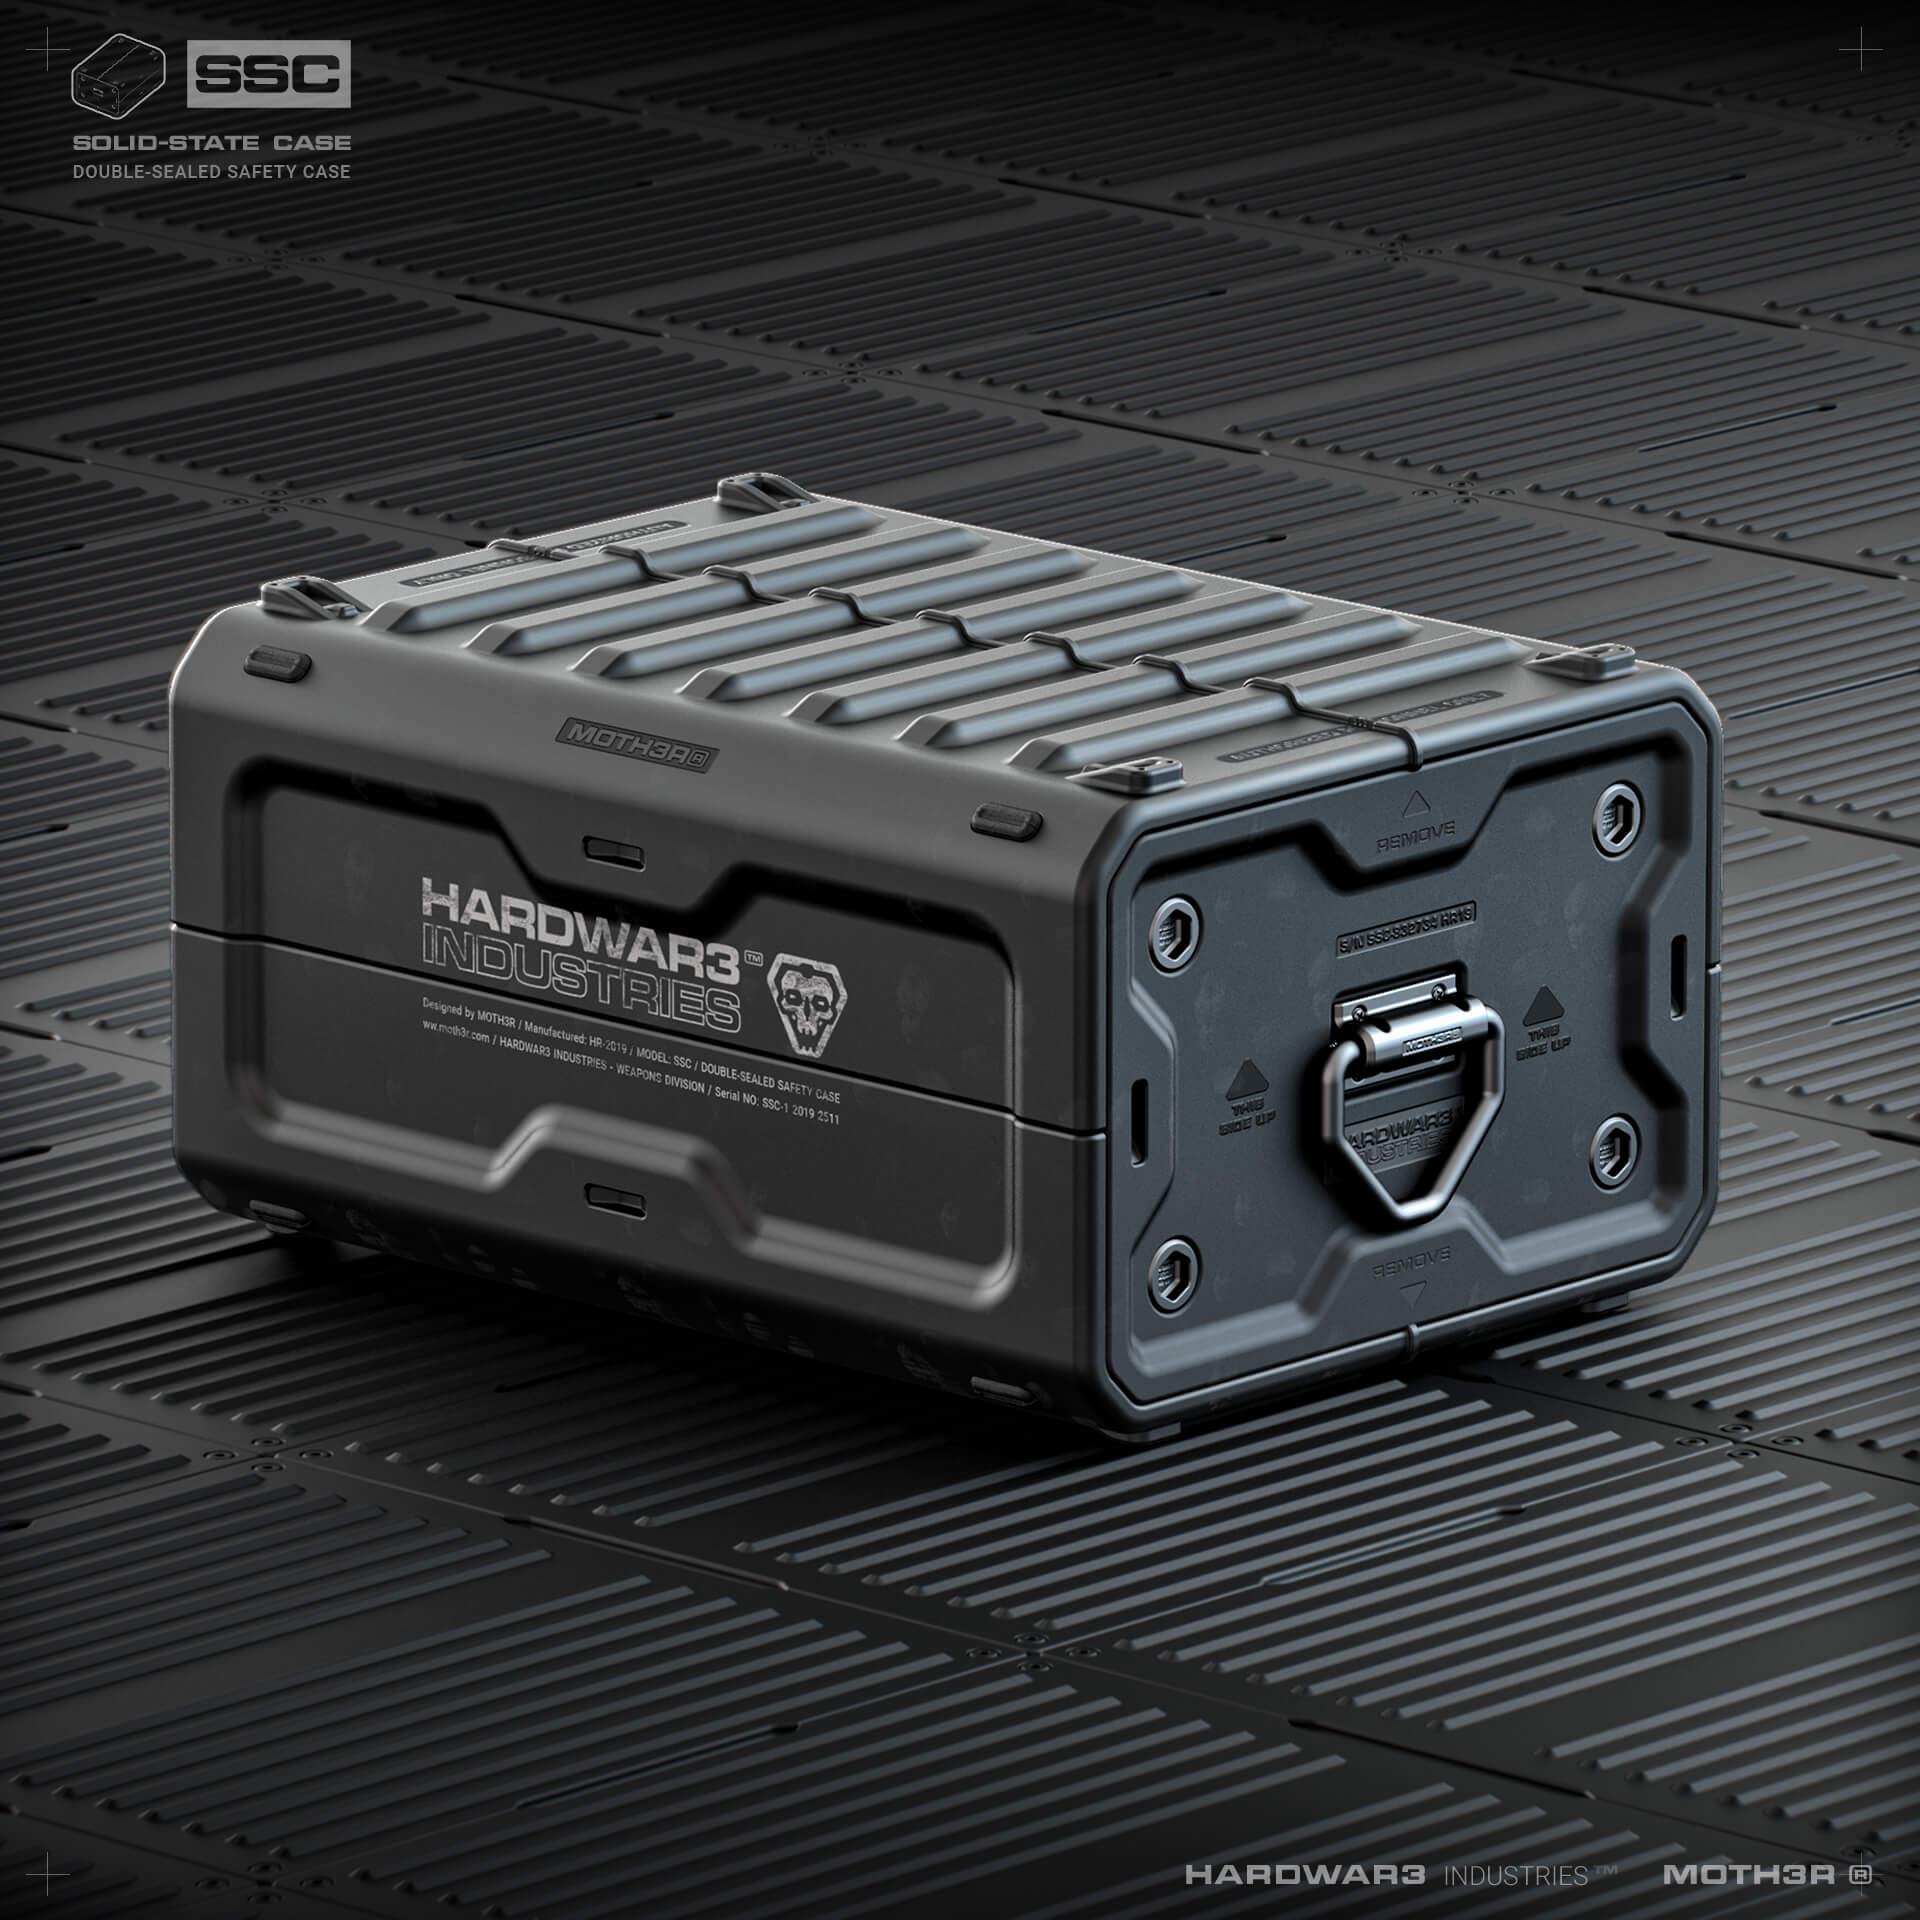 Crate-001.227